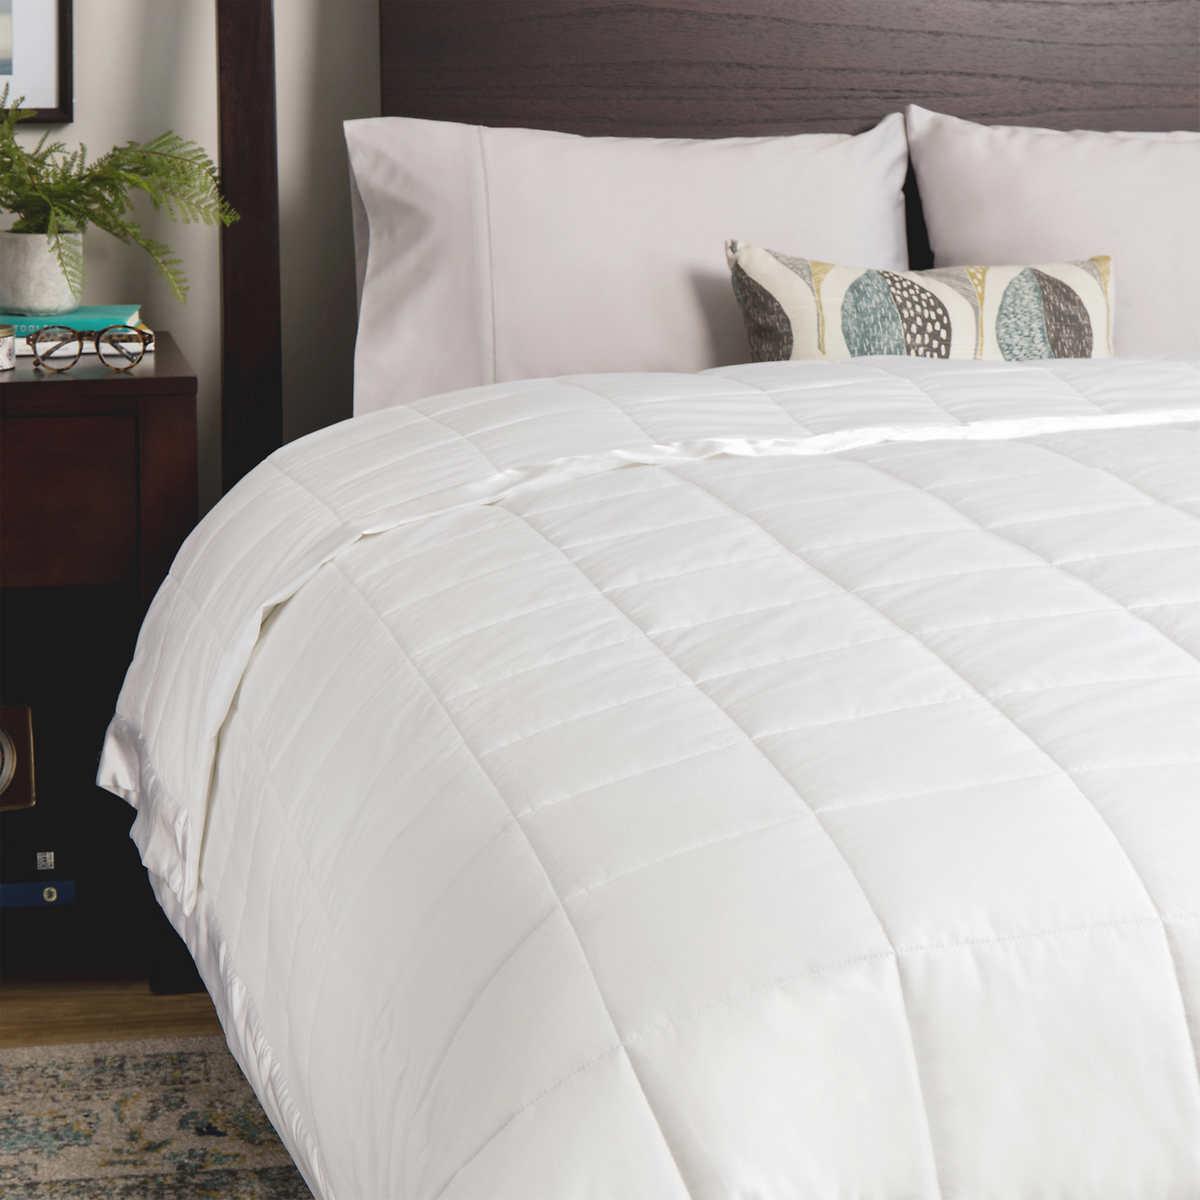 blankets bedding | costco